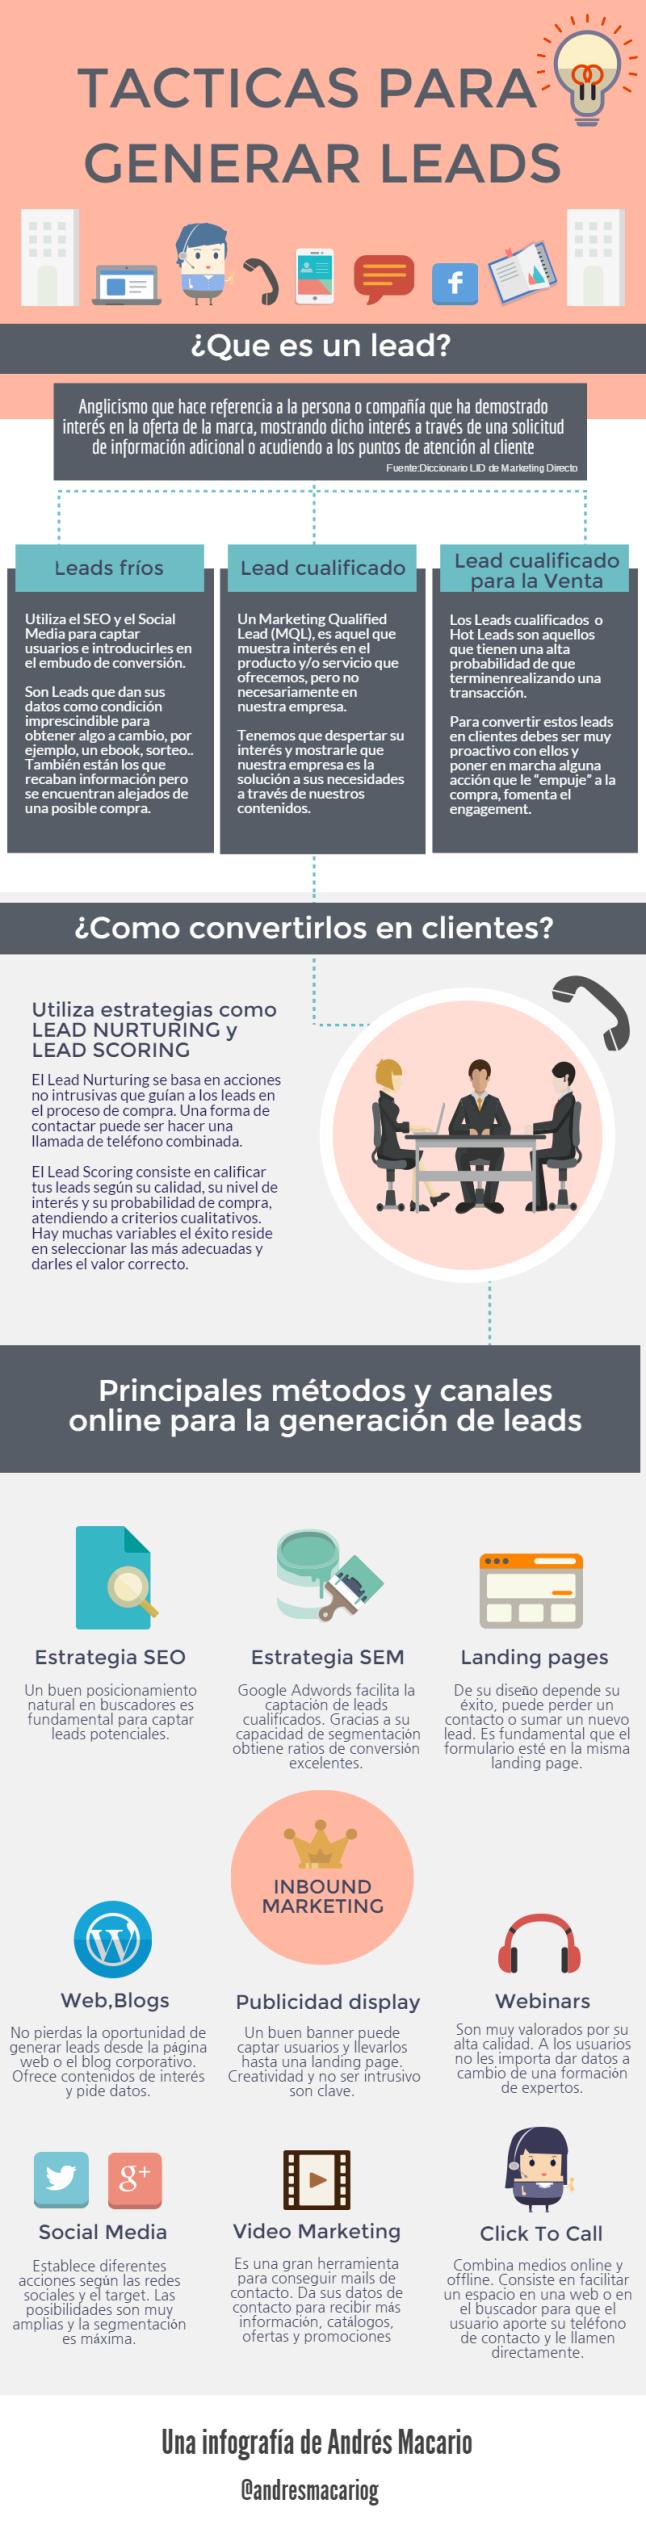 Tacticas para generar leads infografia Andres Macario